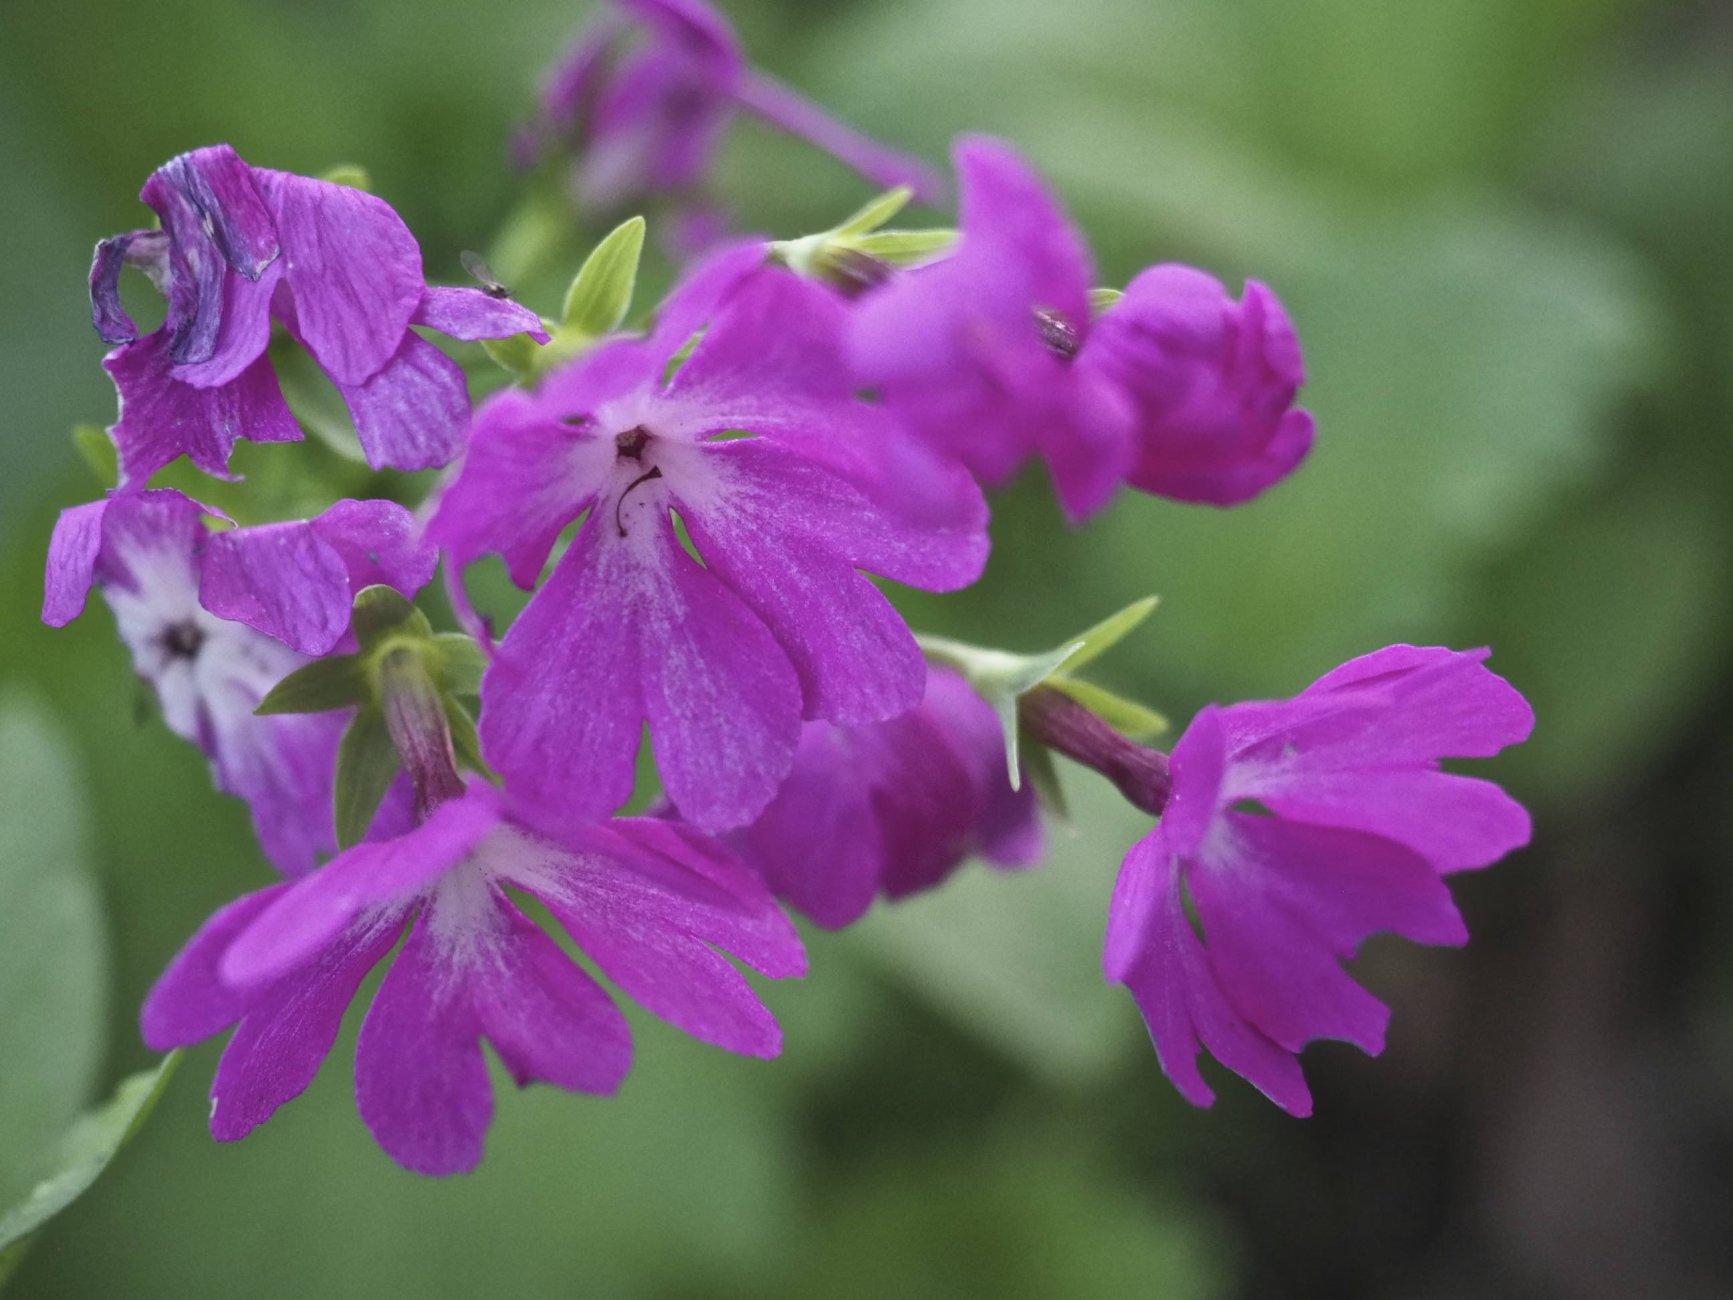 Flowers of Spring #2